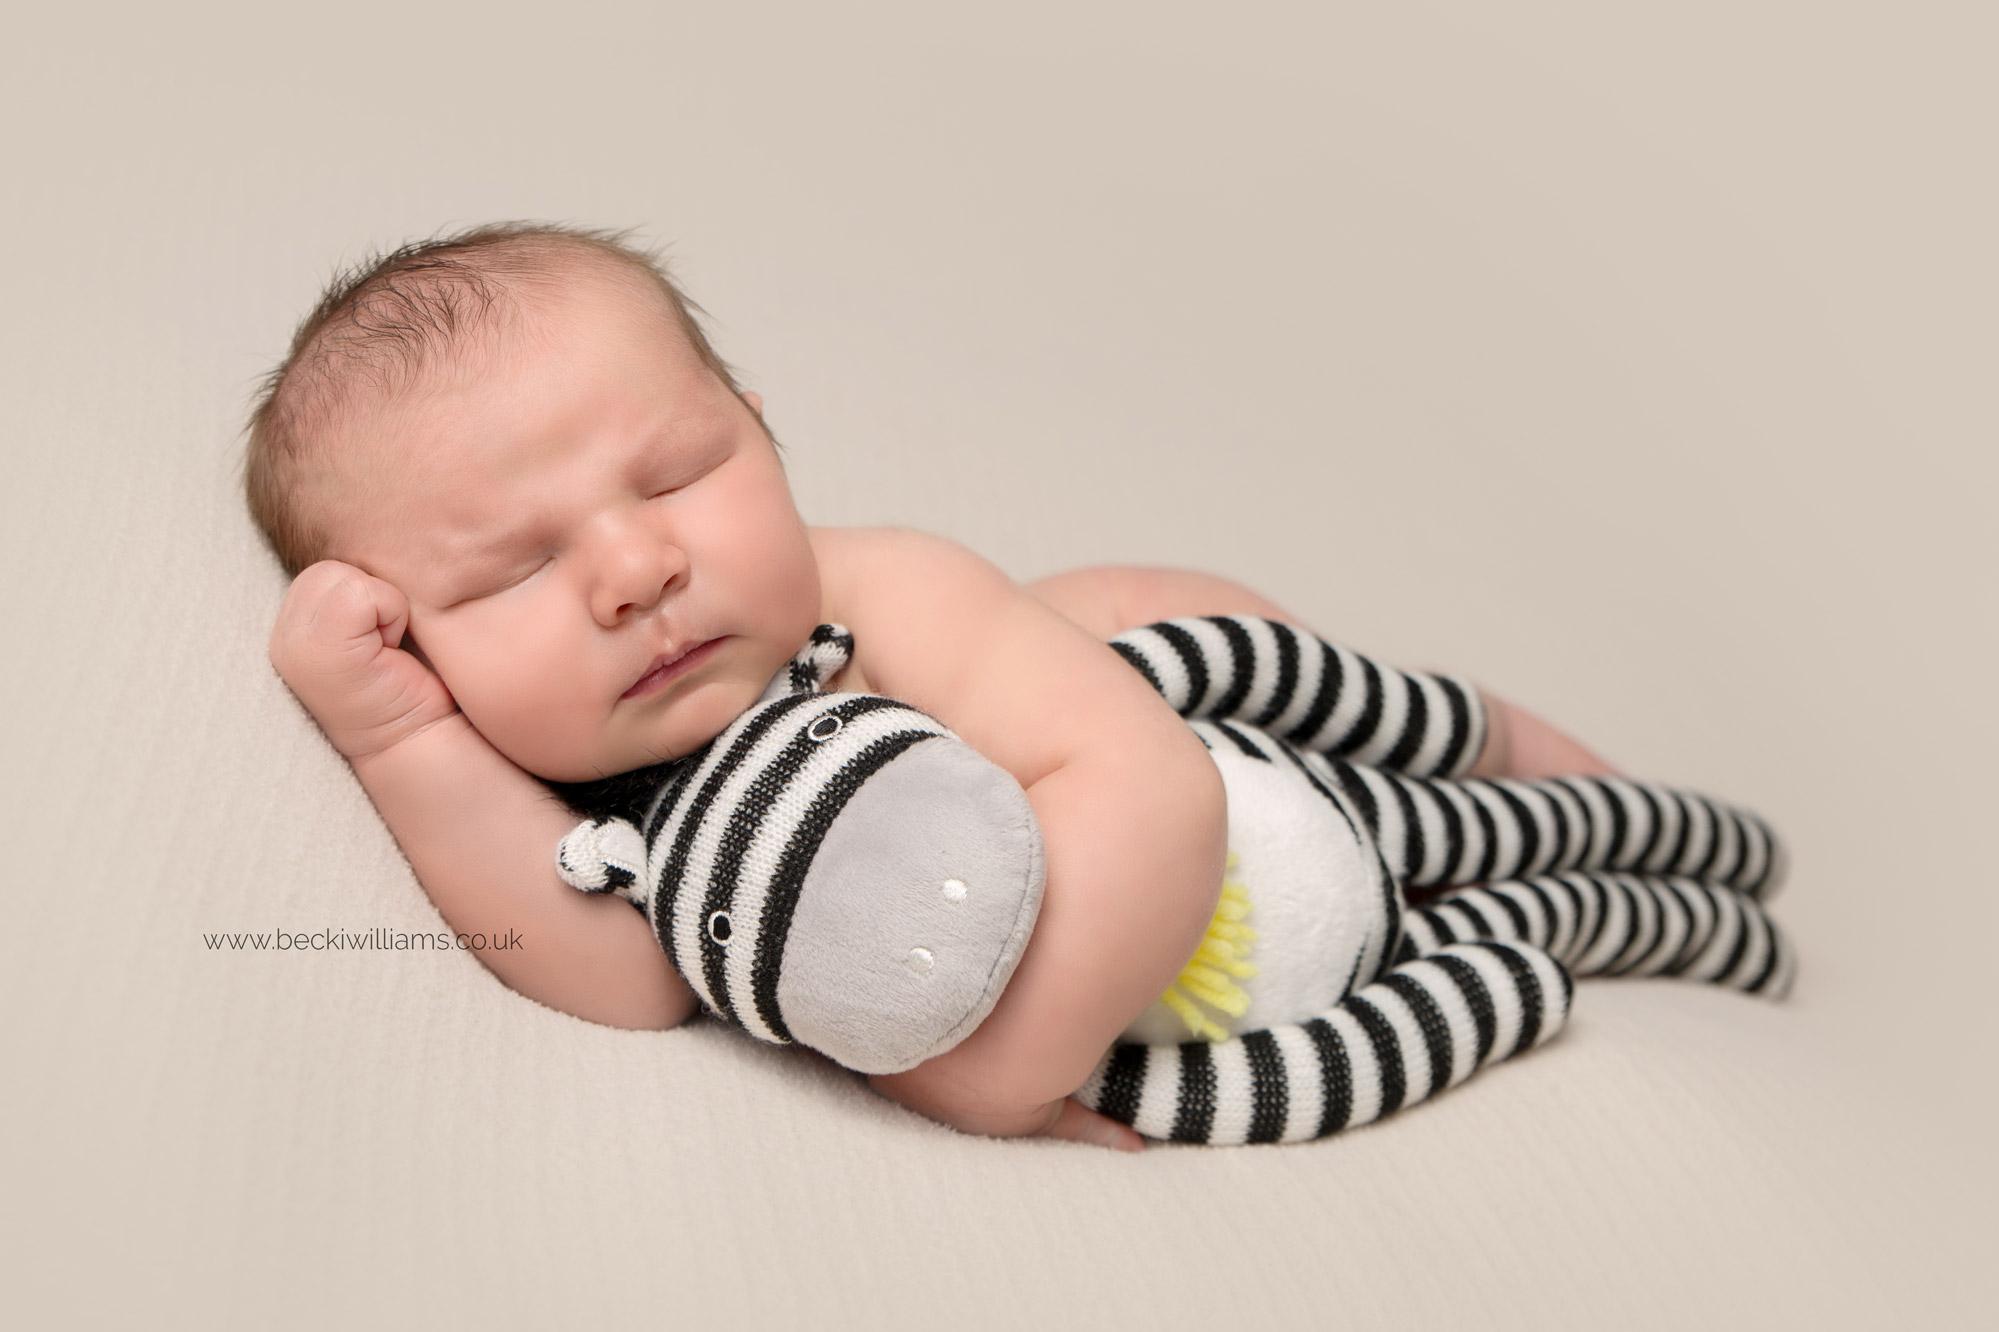 newborn boy laying asleep on his side hugging a sock monkey at his newborn photo shoot in hemel hempstead